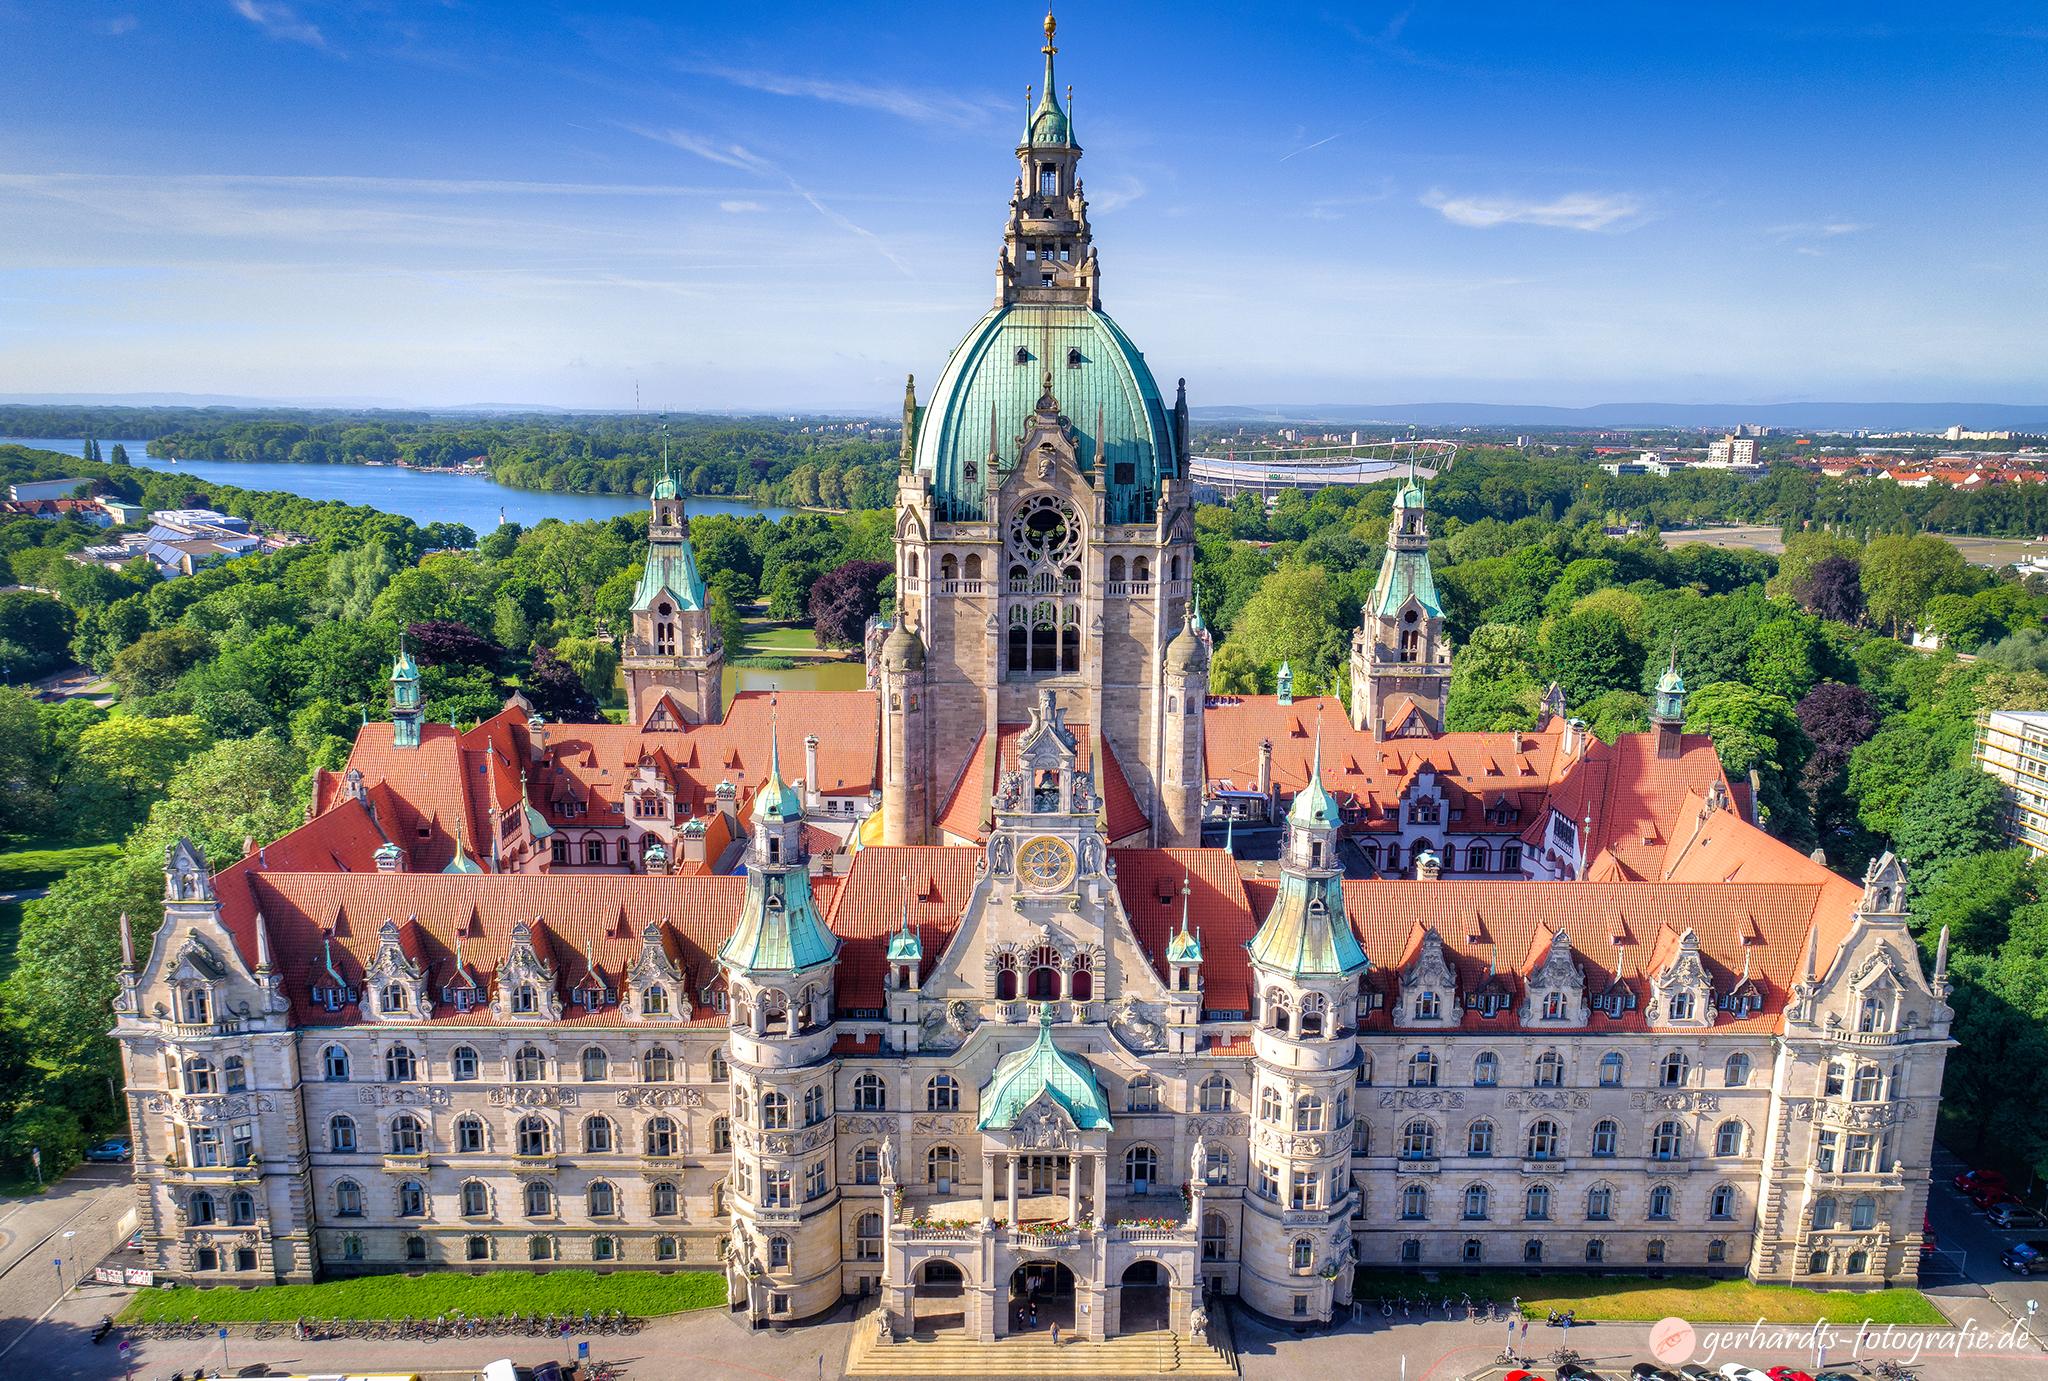 Luftbild Neues Rathaus Hannover